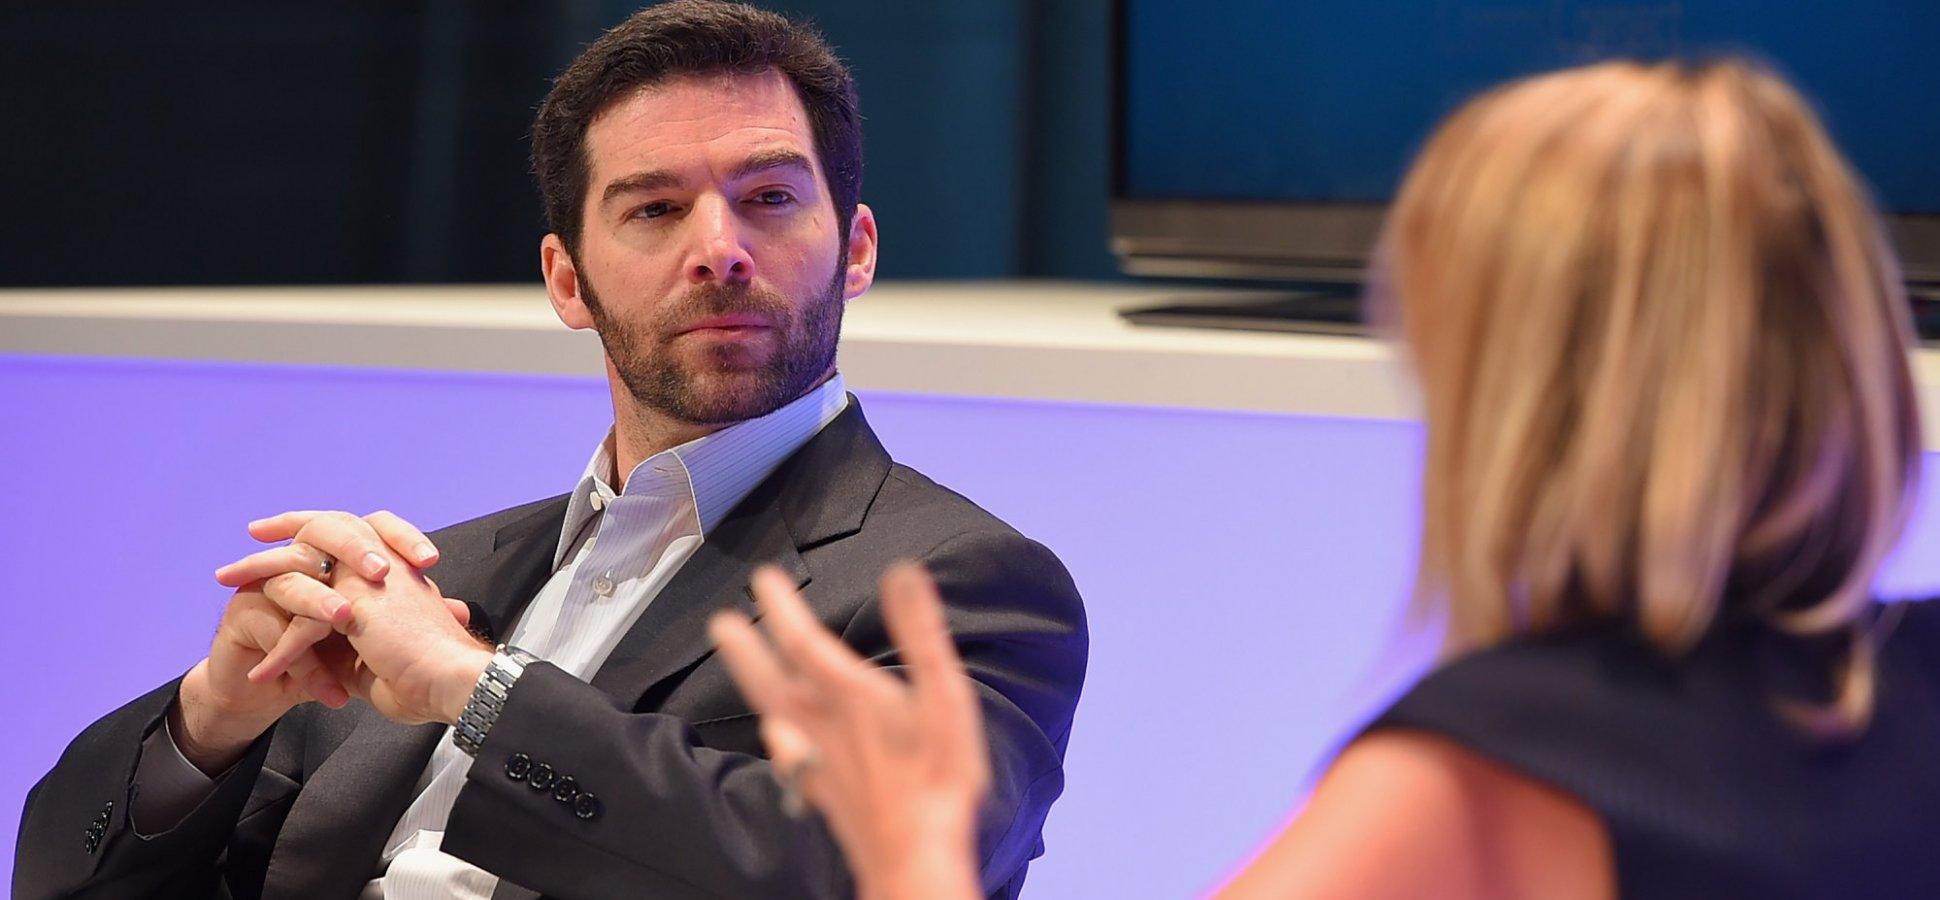 LinkedIn CEO Jeff Weiner Says This 1 Simple Rule Will Eliminate Useless Meetings